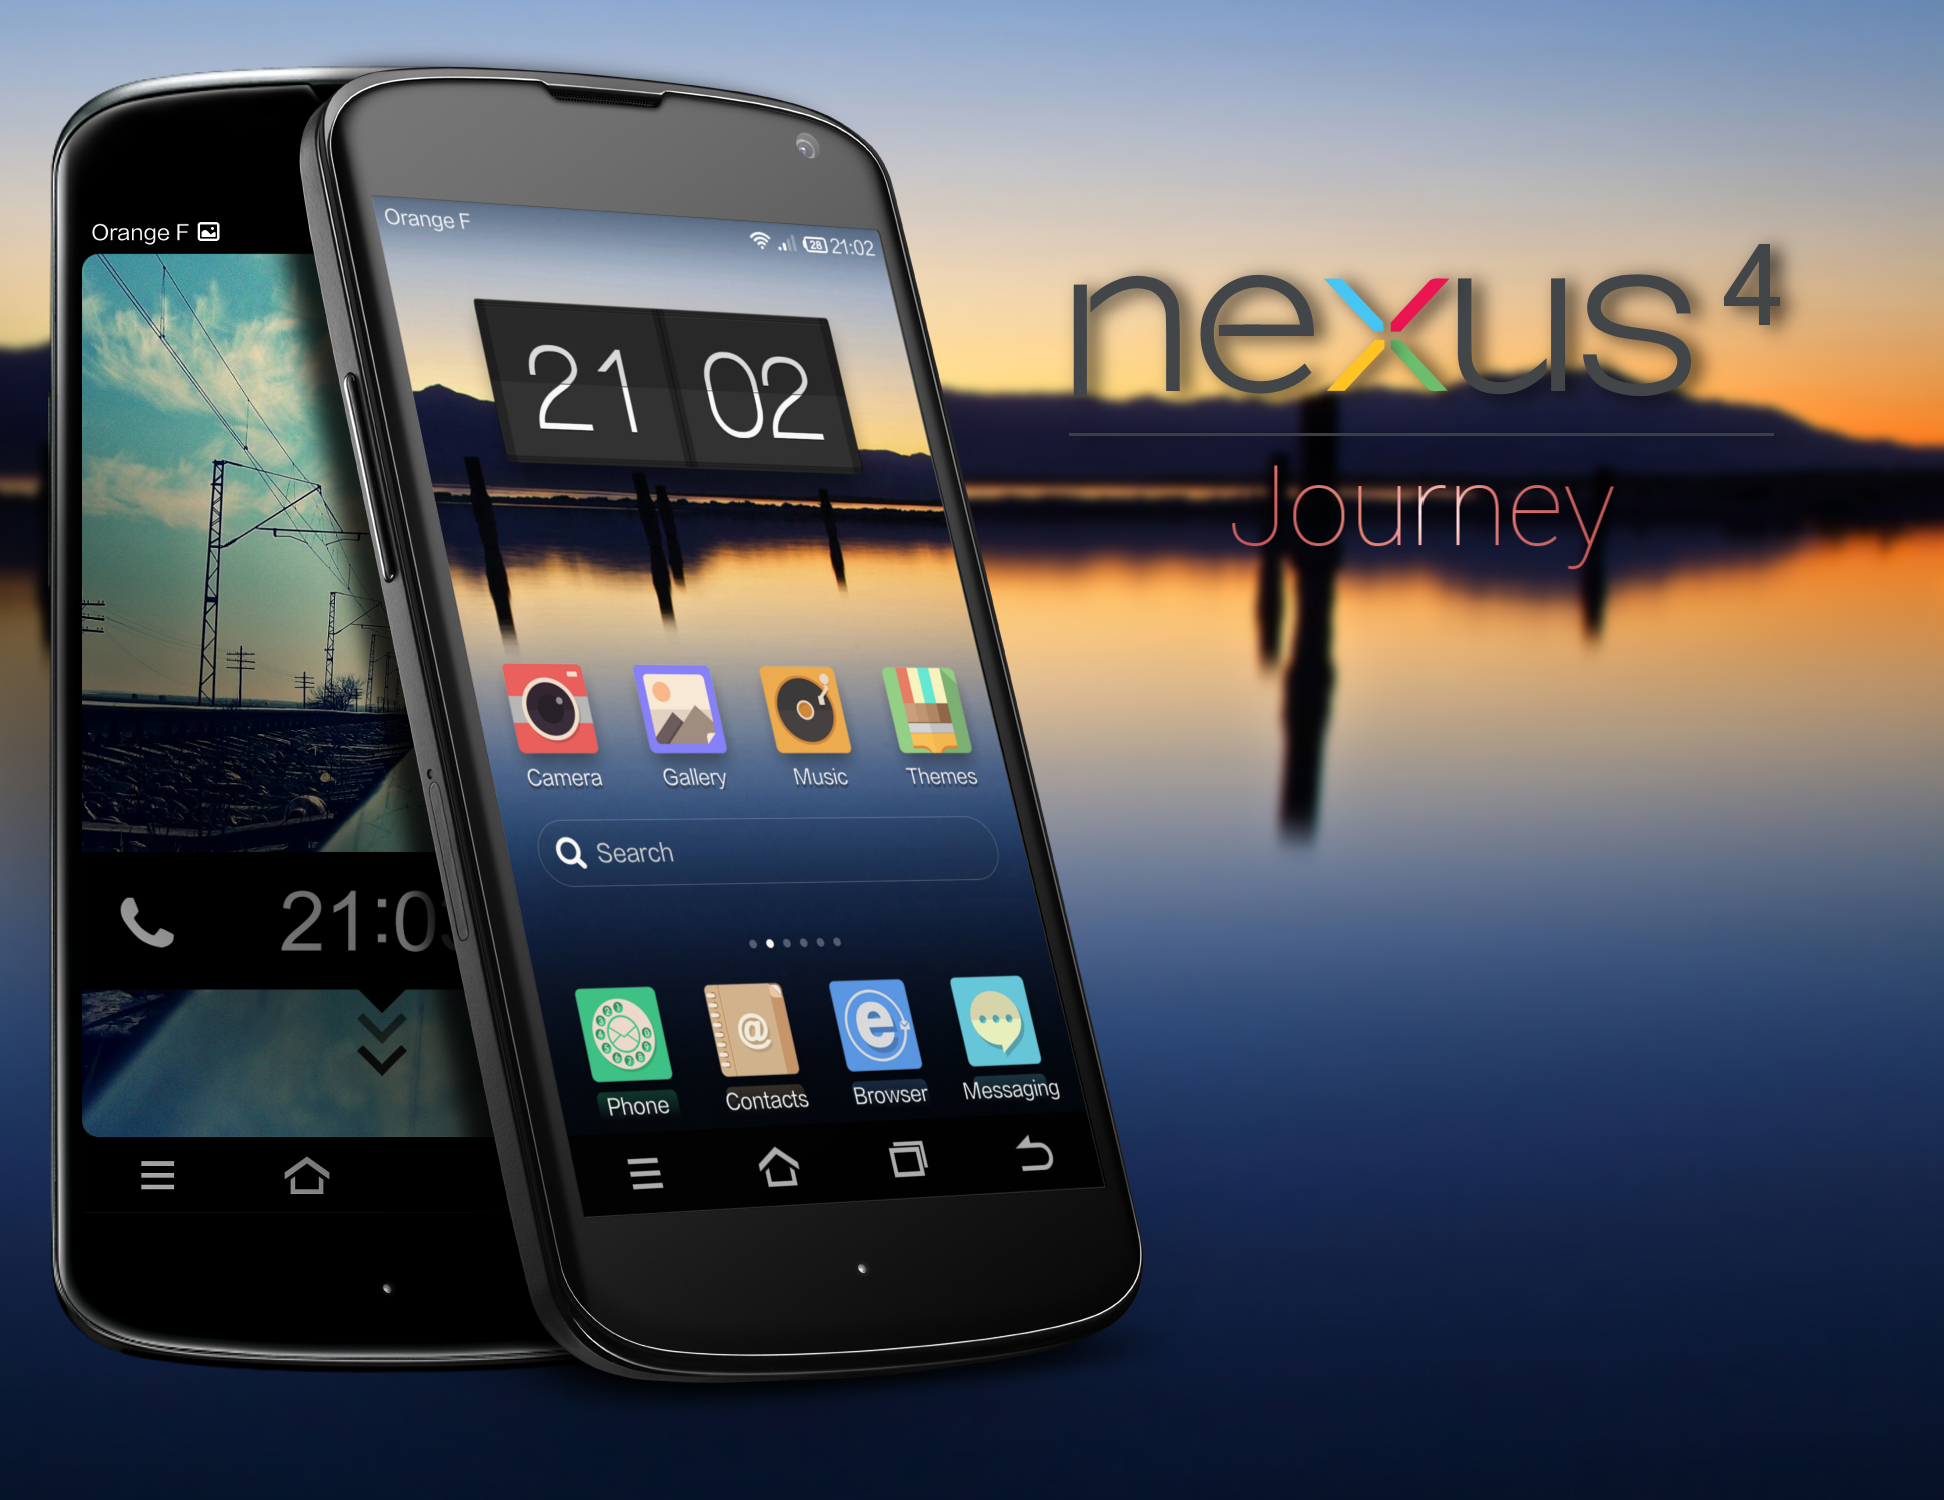 1379705139-nexus4-7.jpg